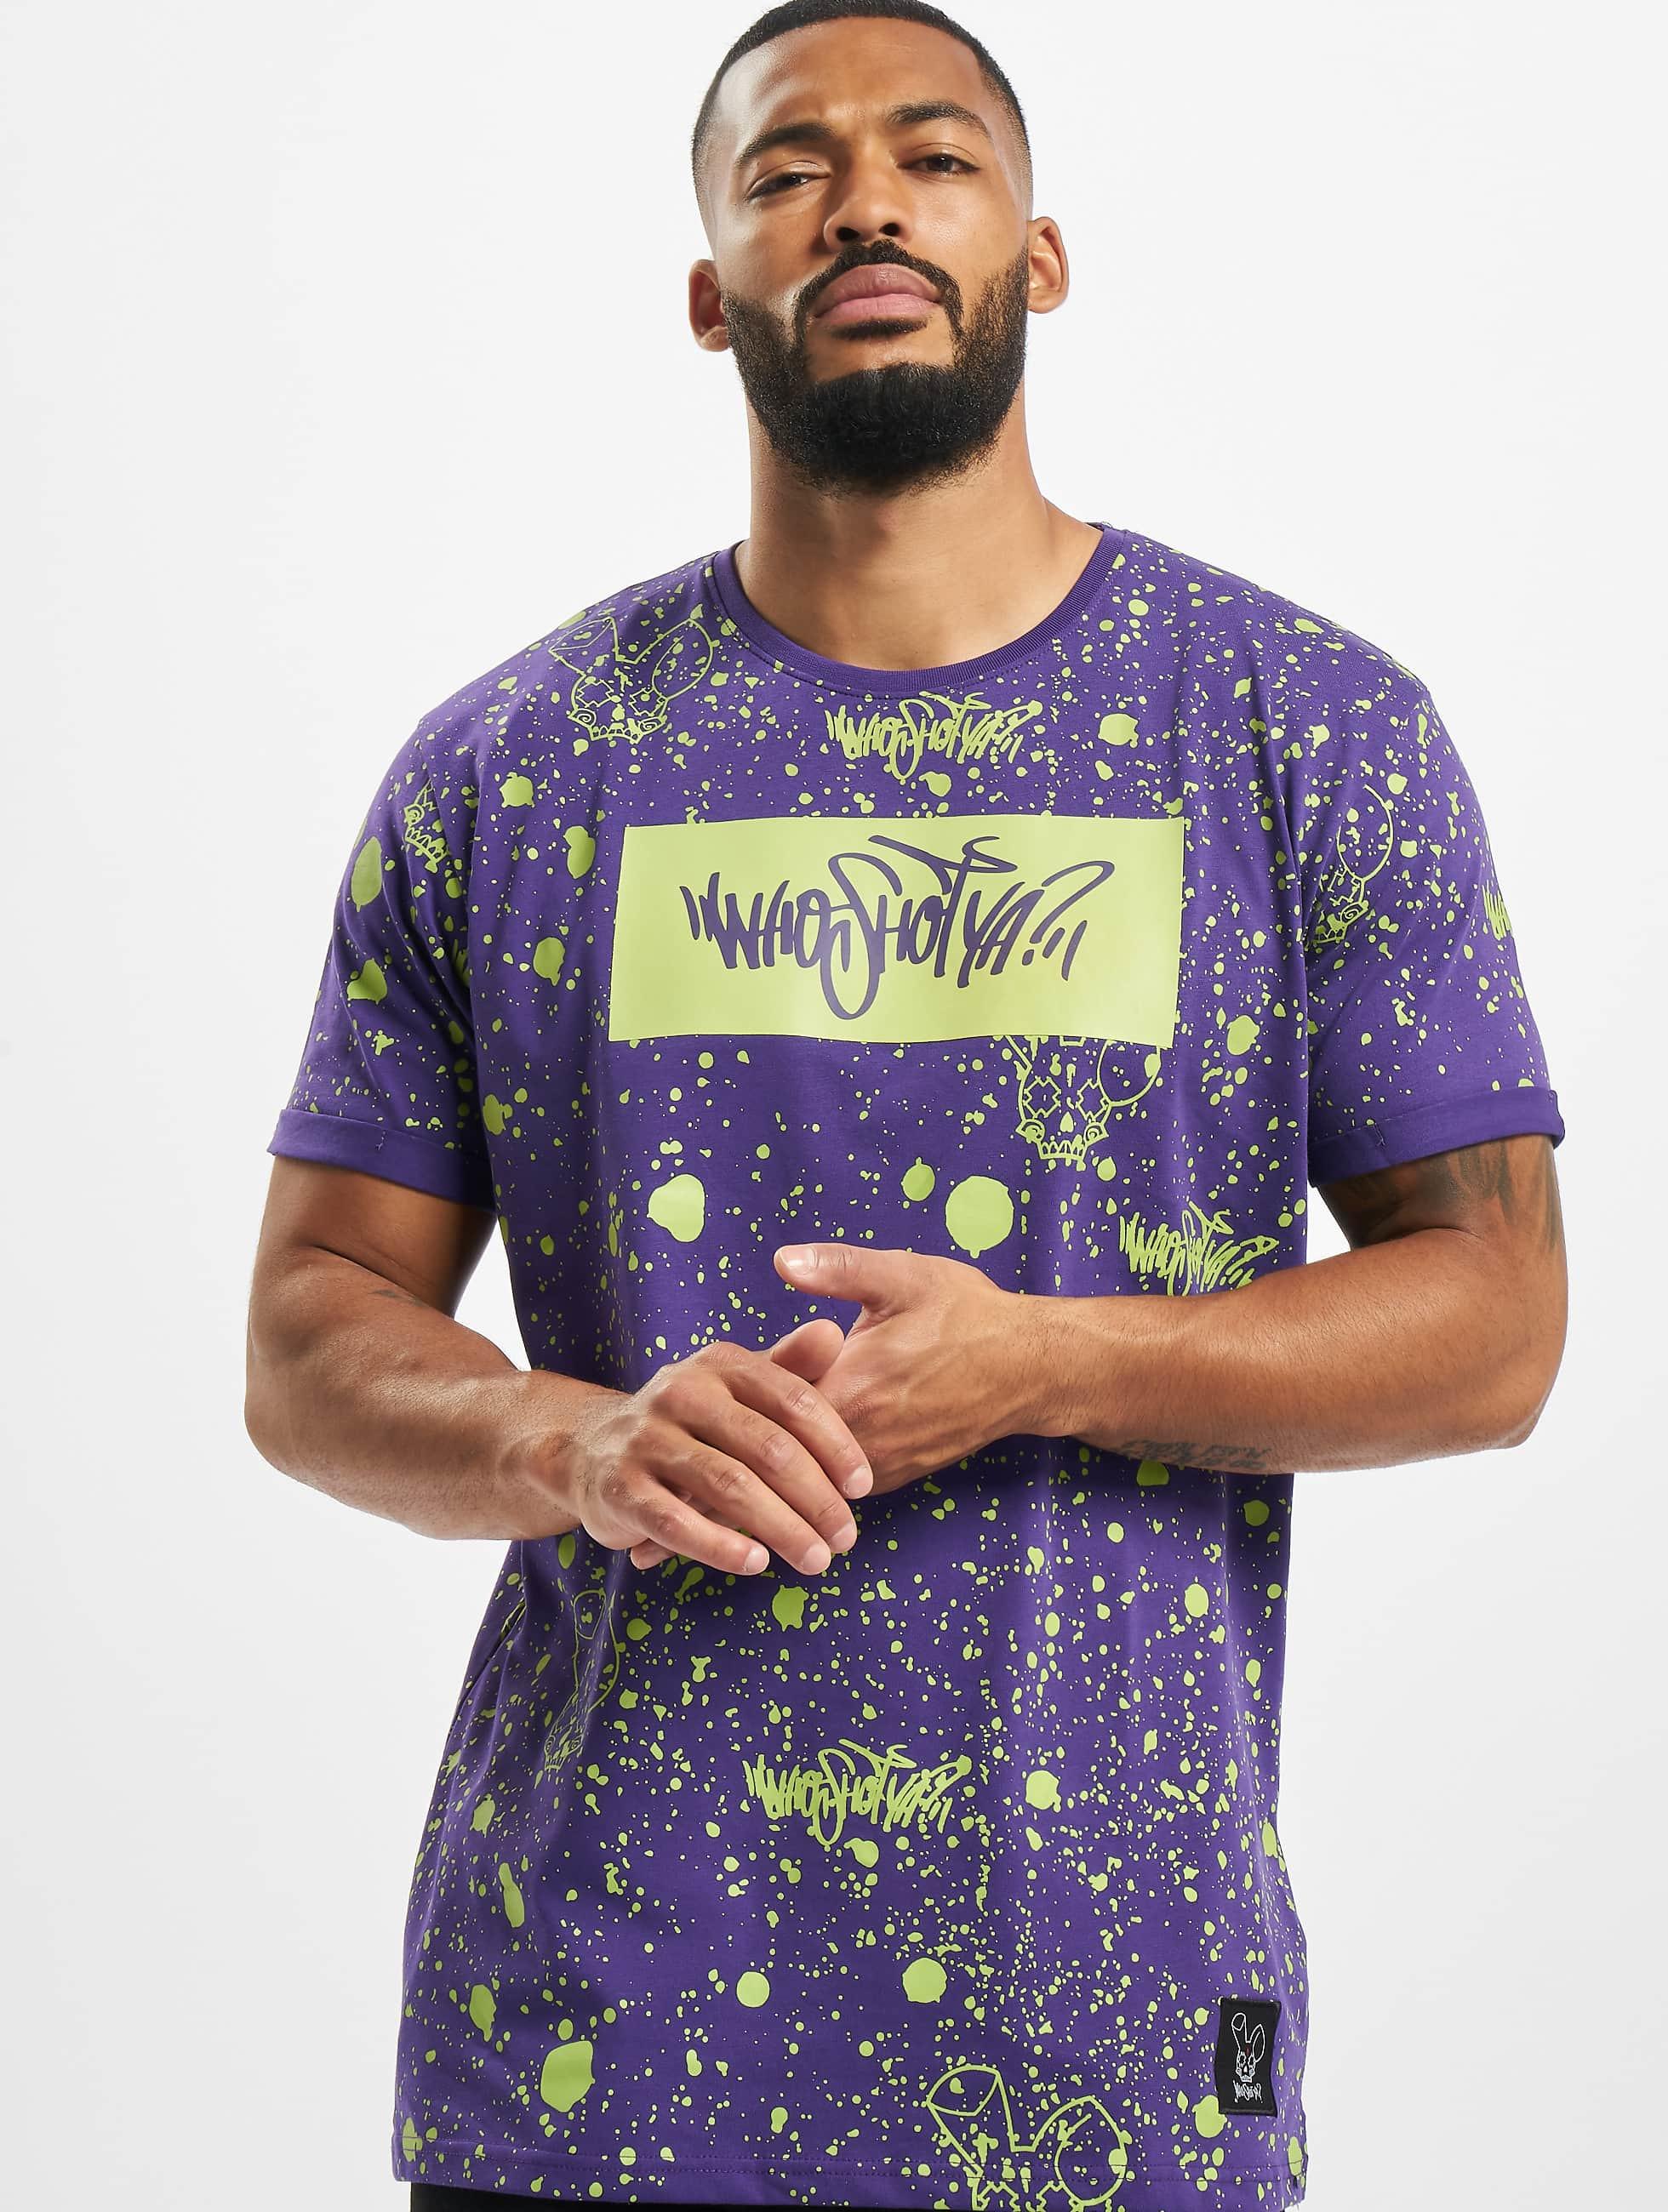 Who Shot Ya? / T-Shirt W Zone in purple 3XL